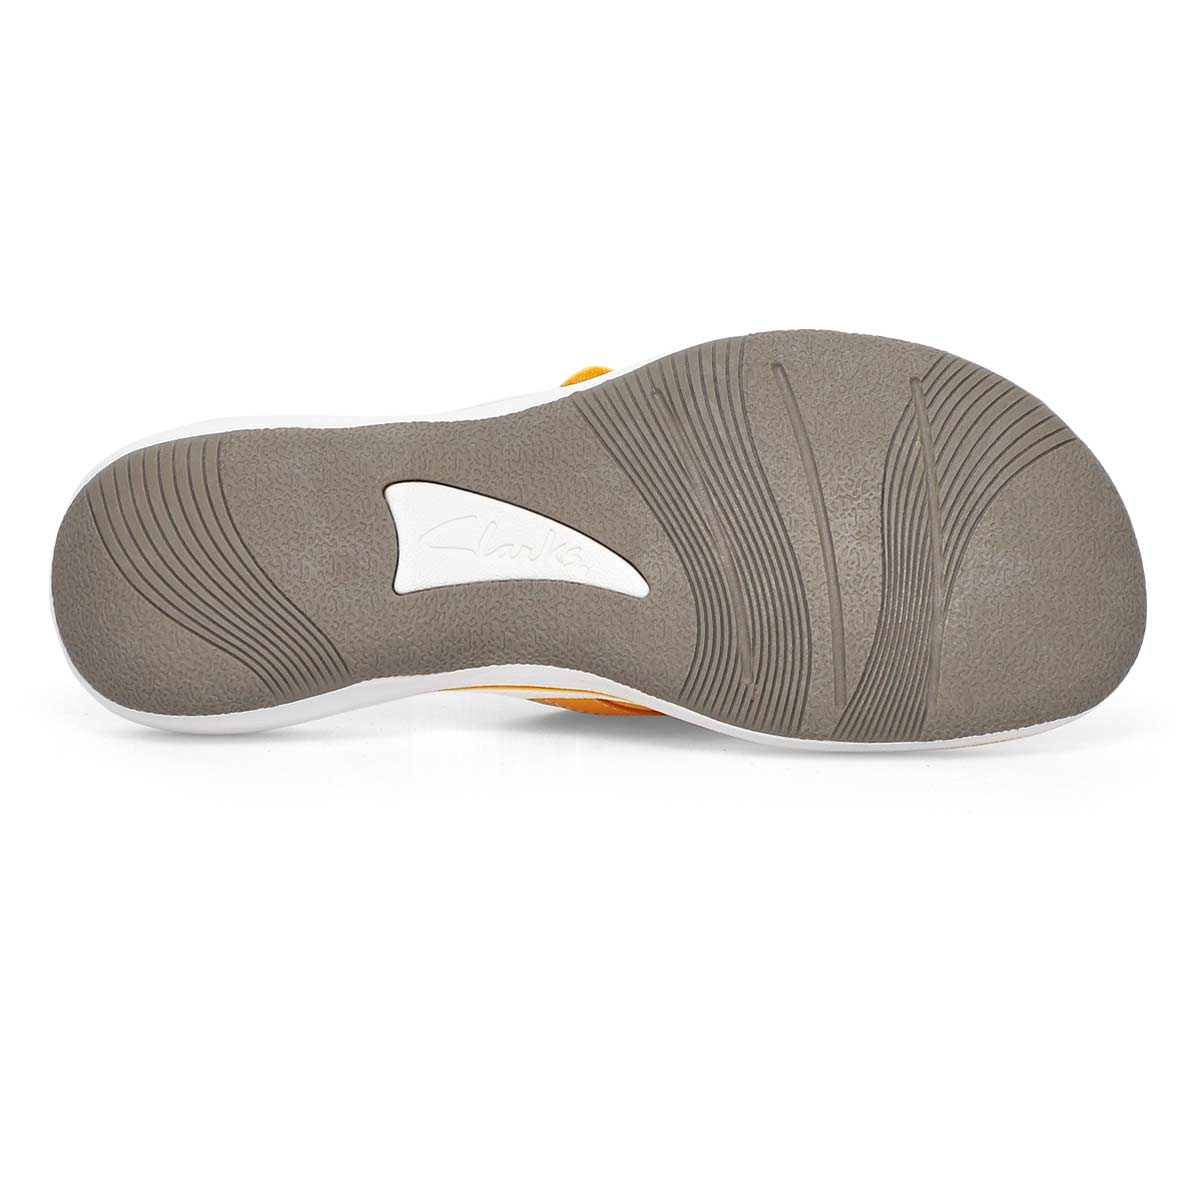 Women's Breeze Sea Thong Sandal - Burnt Yellow